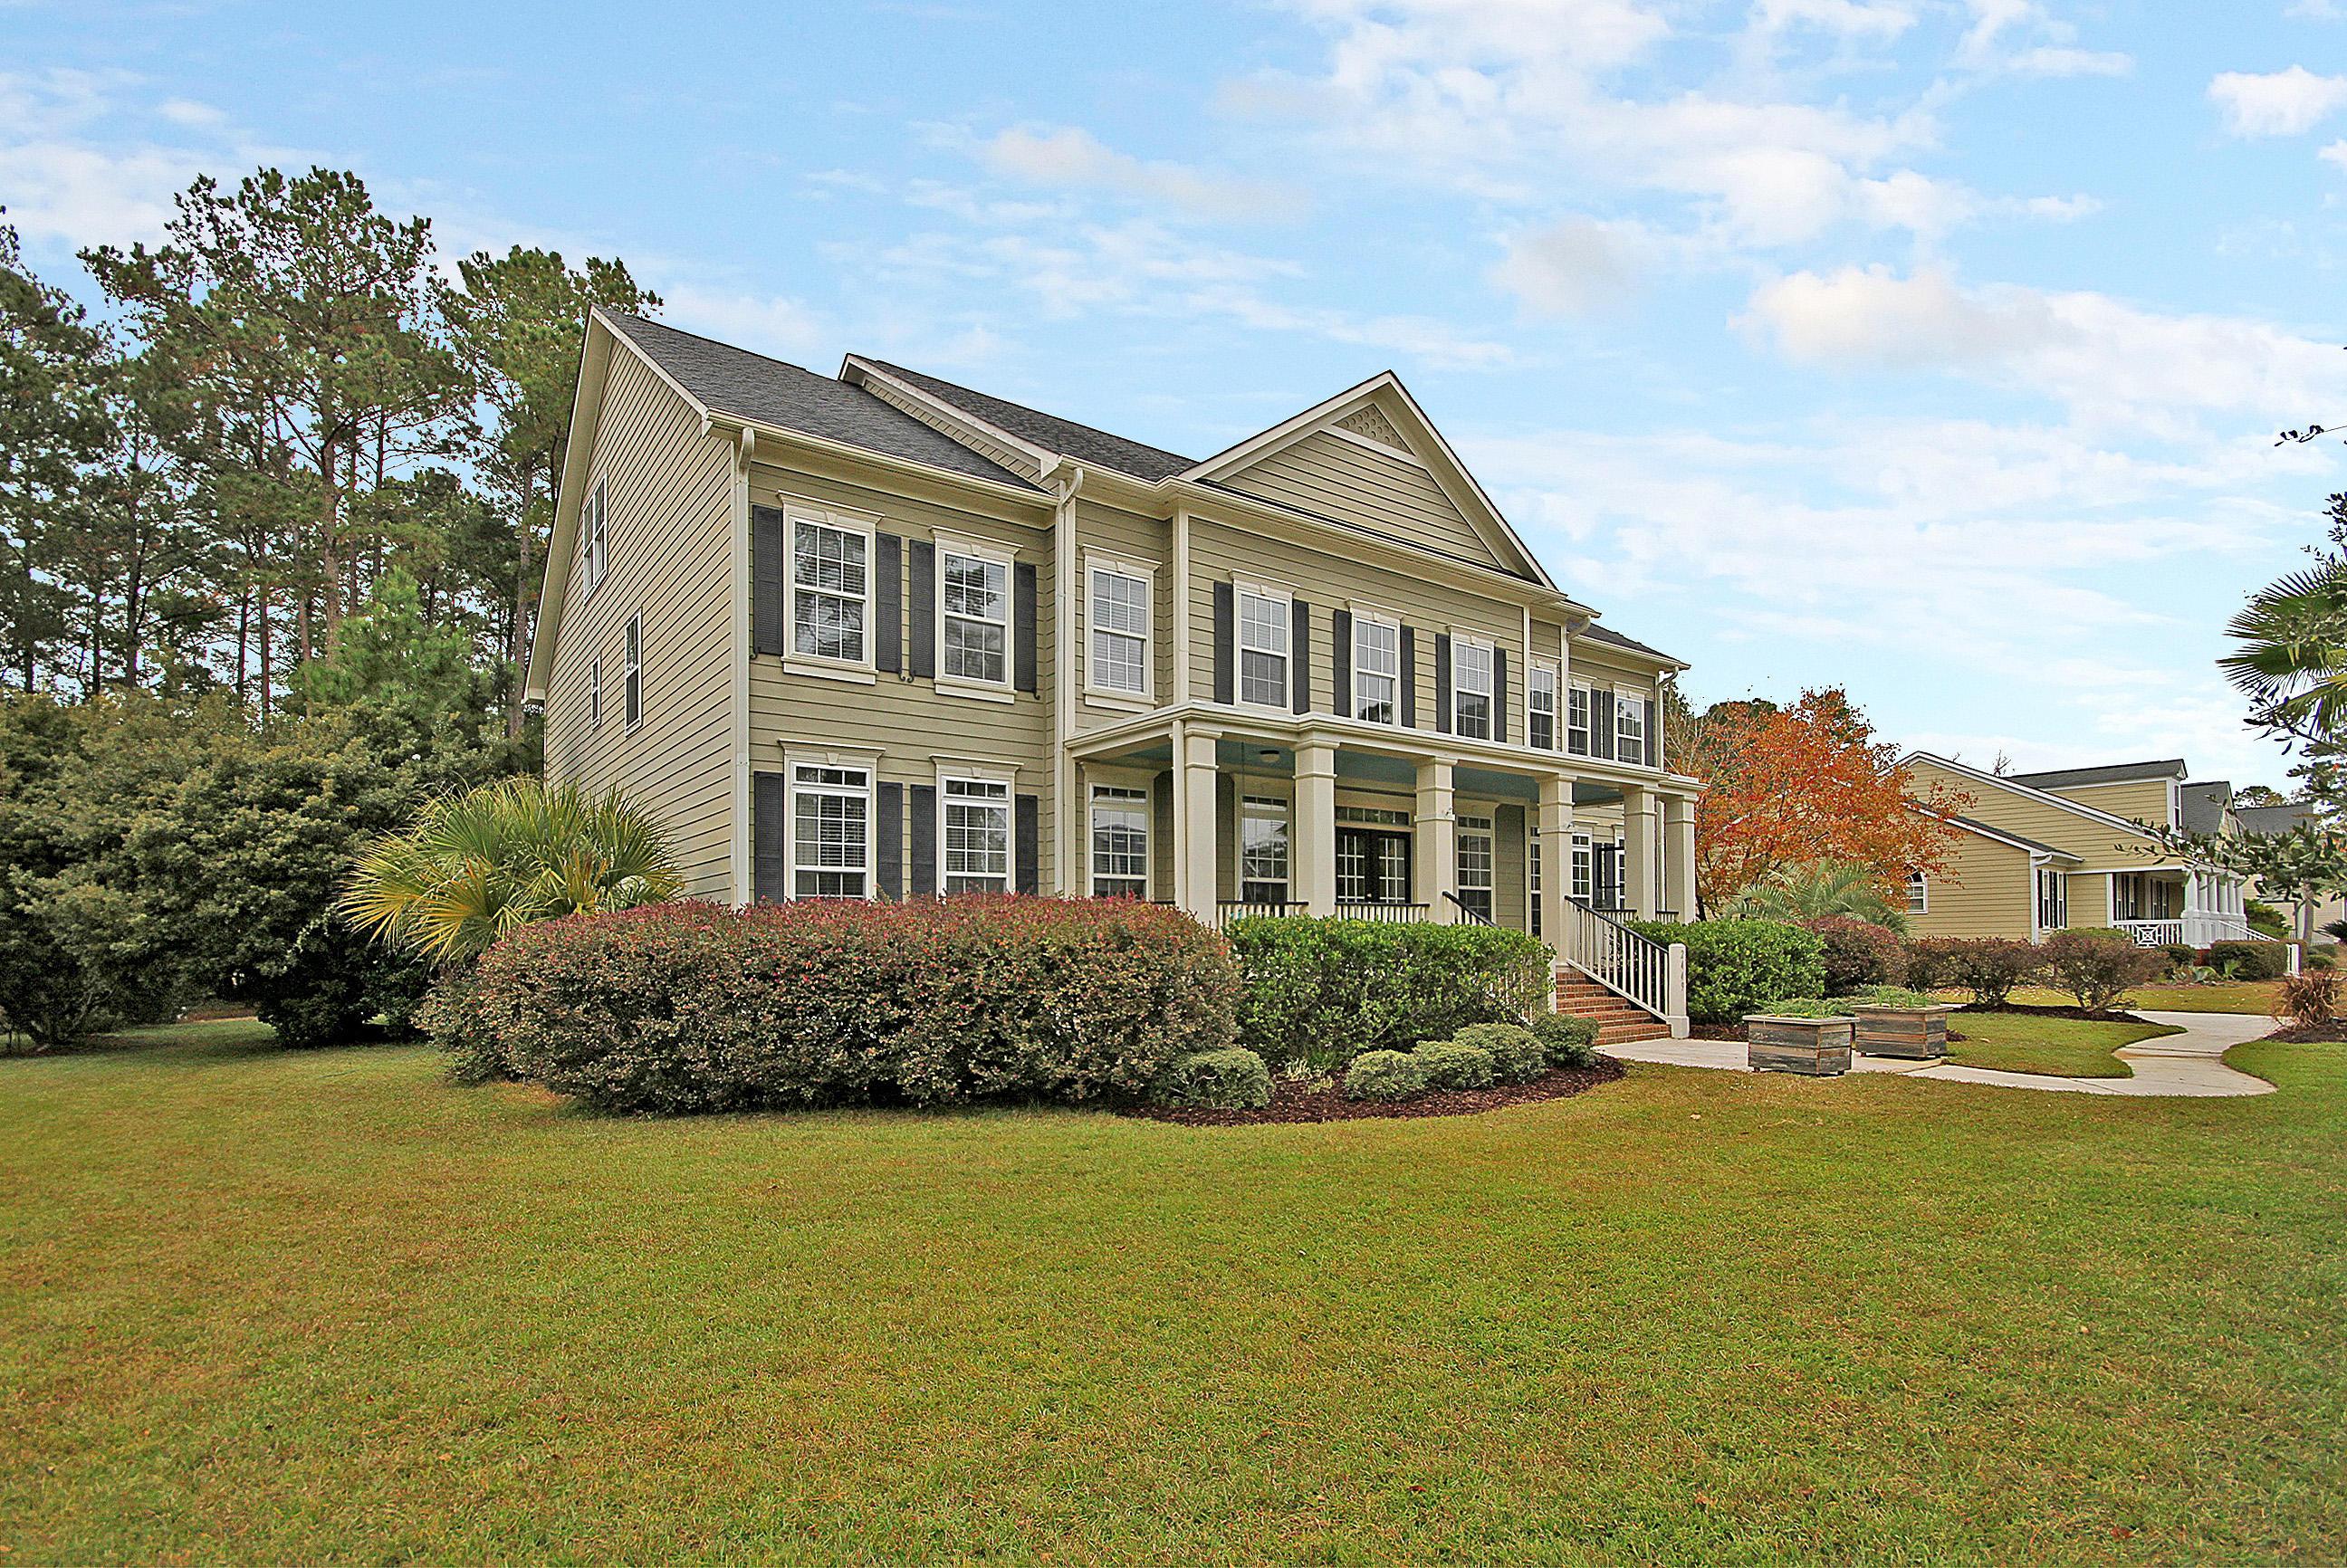 Dunes West Homes For Sale - 2449 Darts Cove, Mount Pleasant, SC - 12